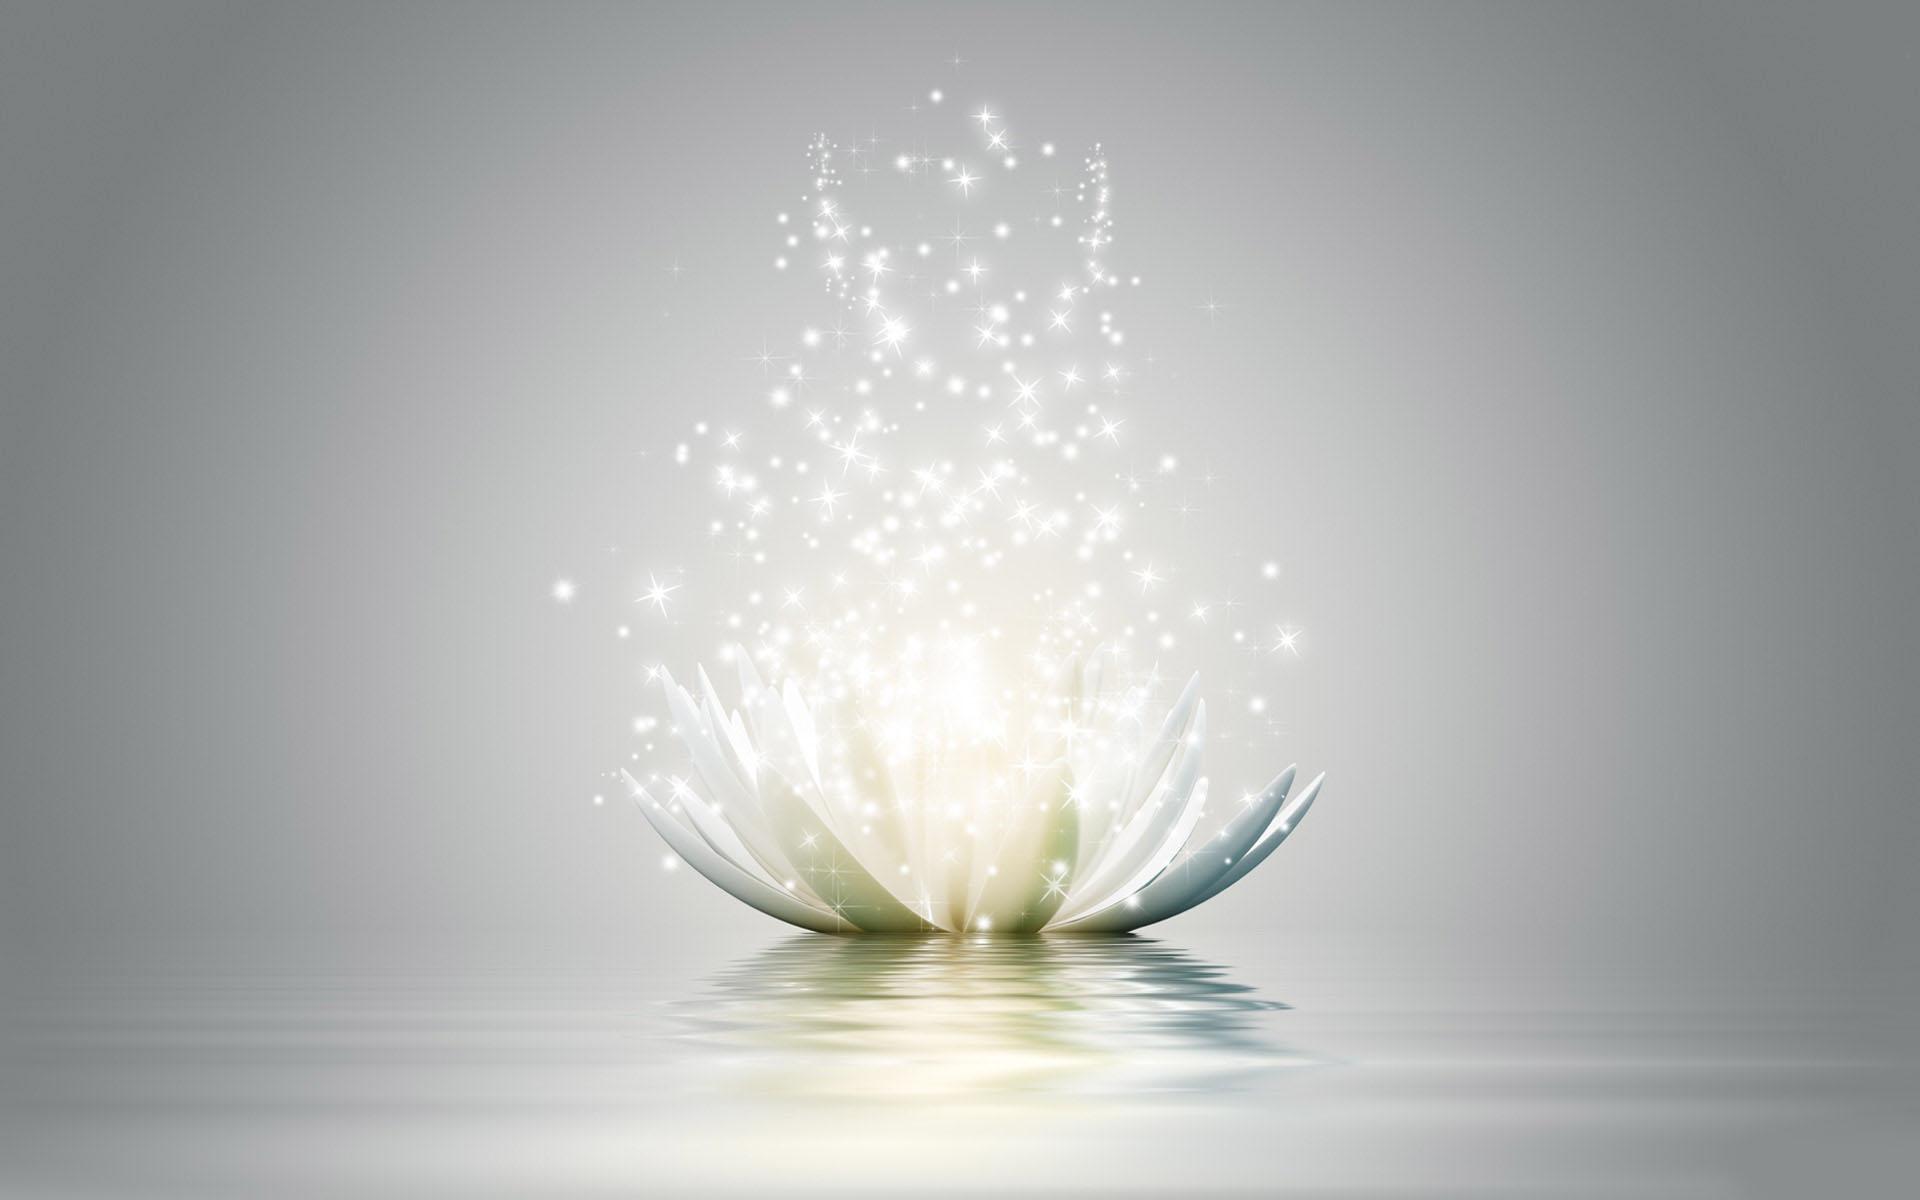 Lotus Flower Wallpaper Araya Rebirth